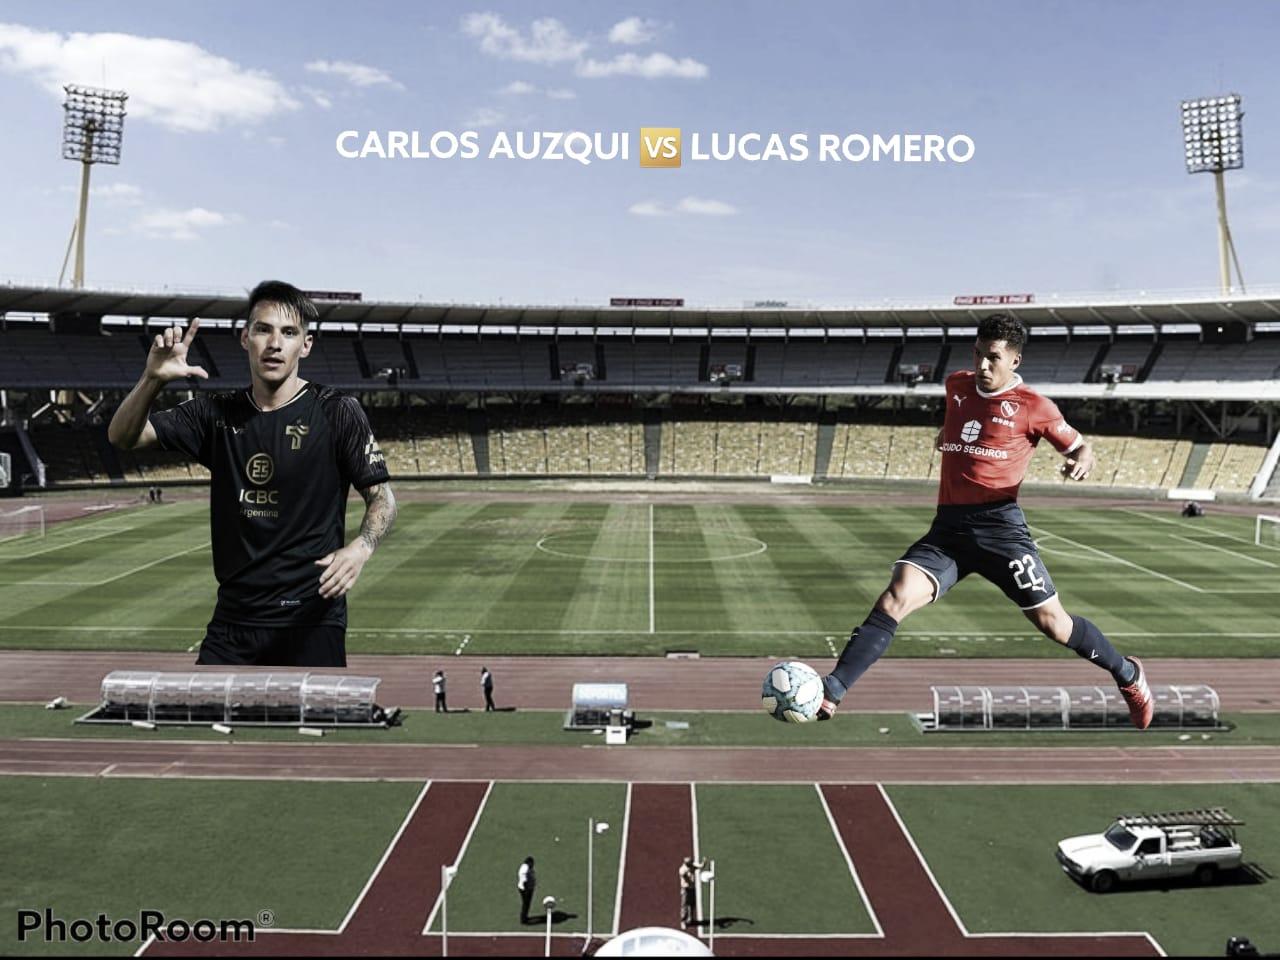 Cara a cara: Lucas Romero Vs. Carlos Auzqui